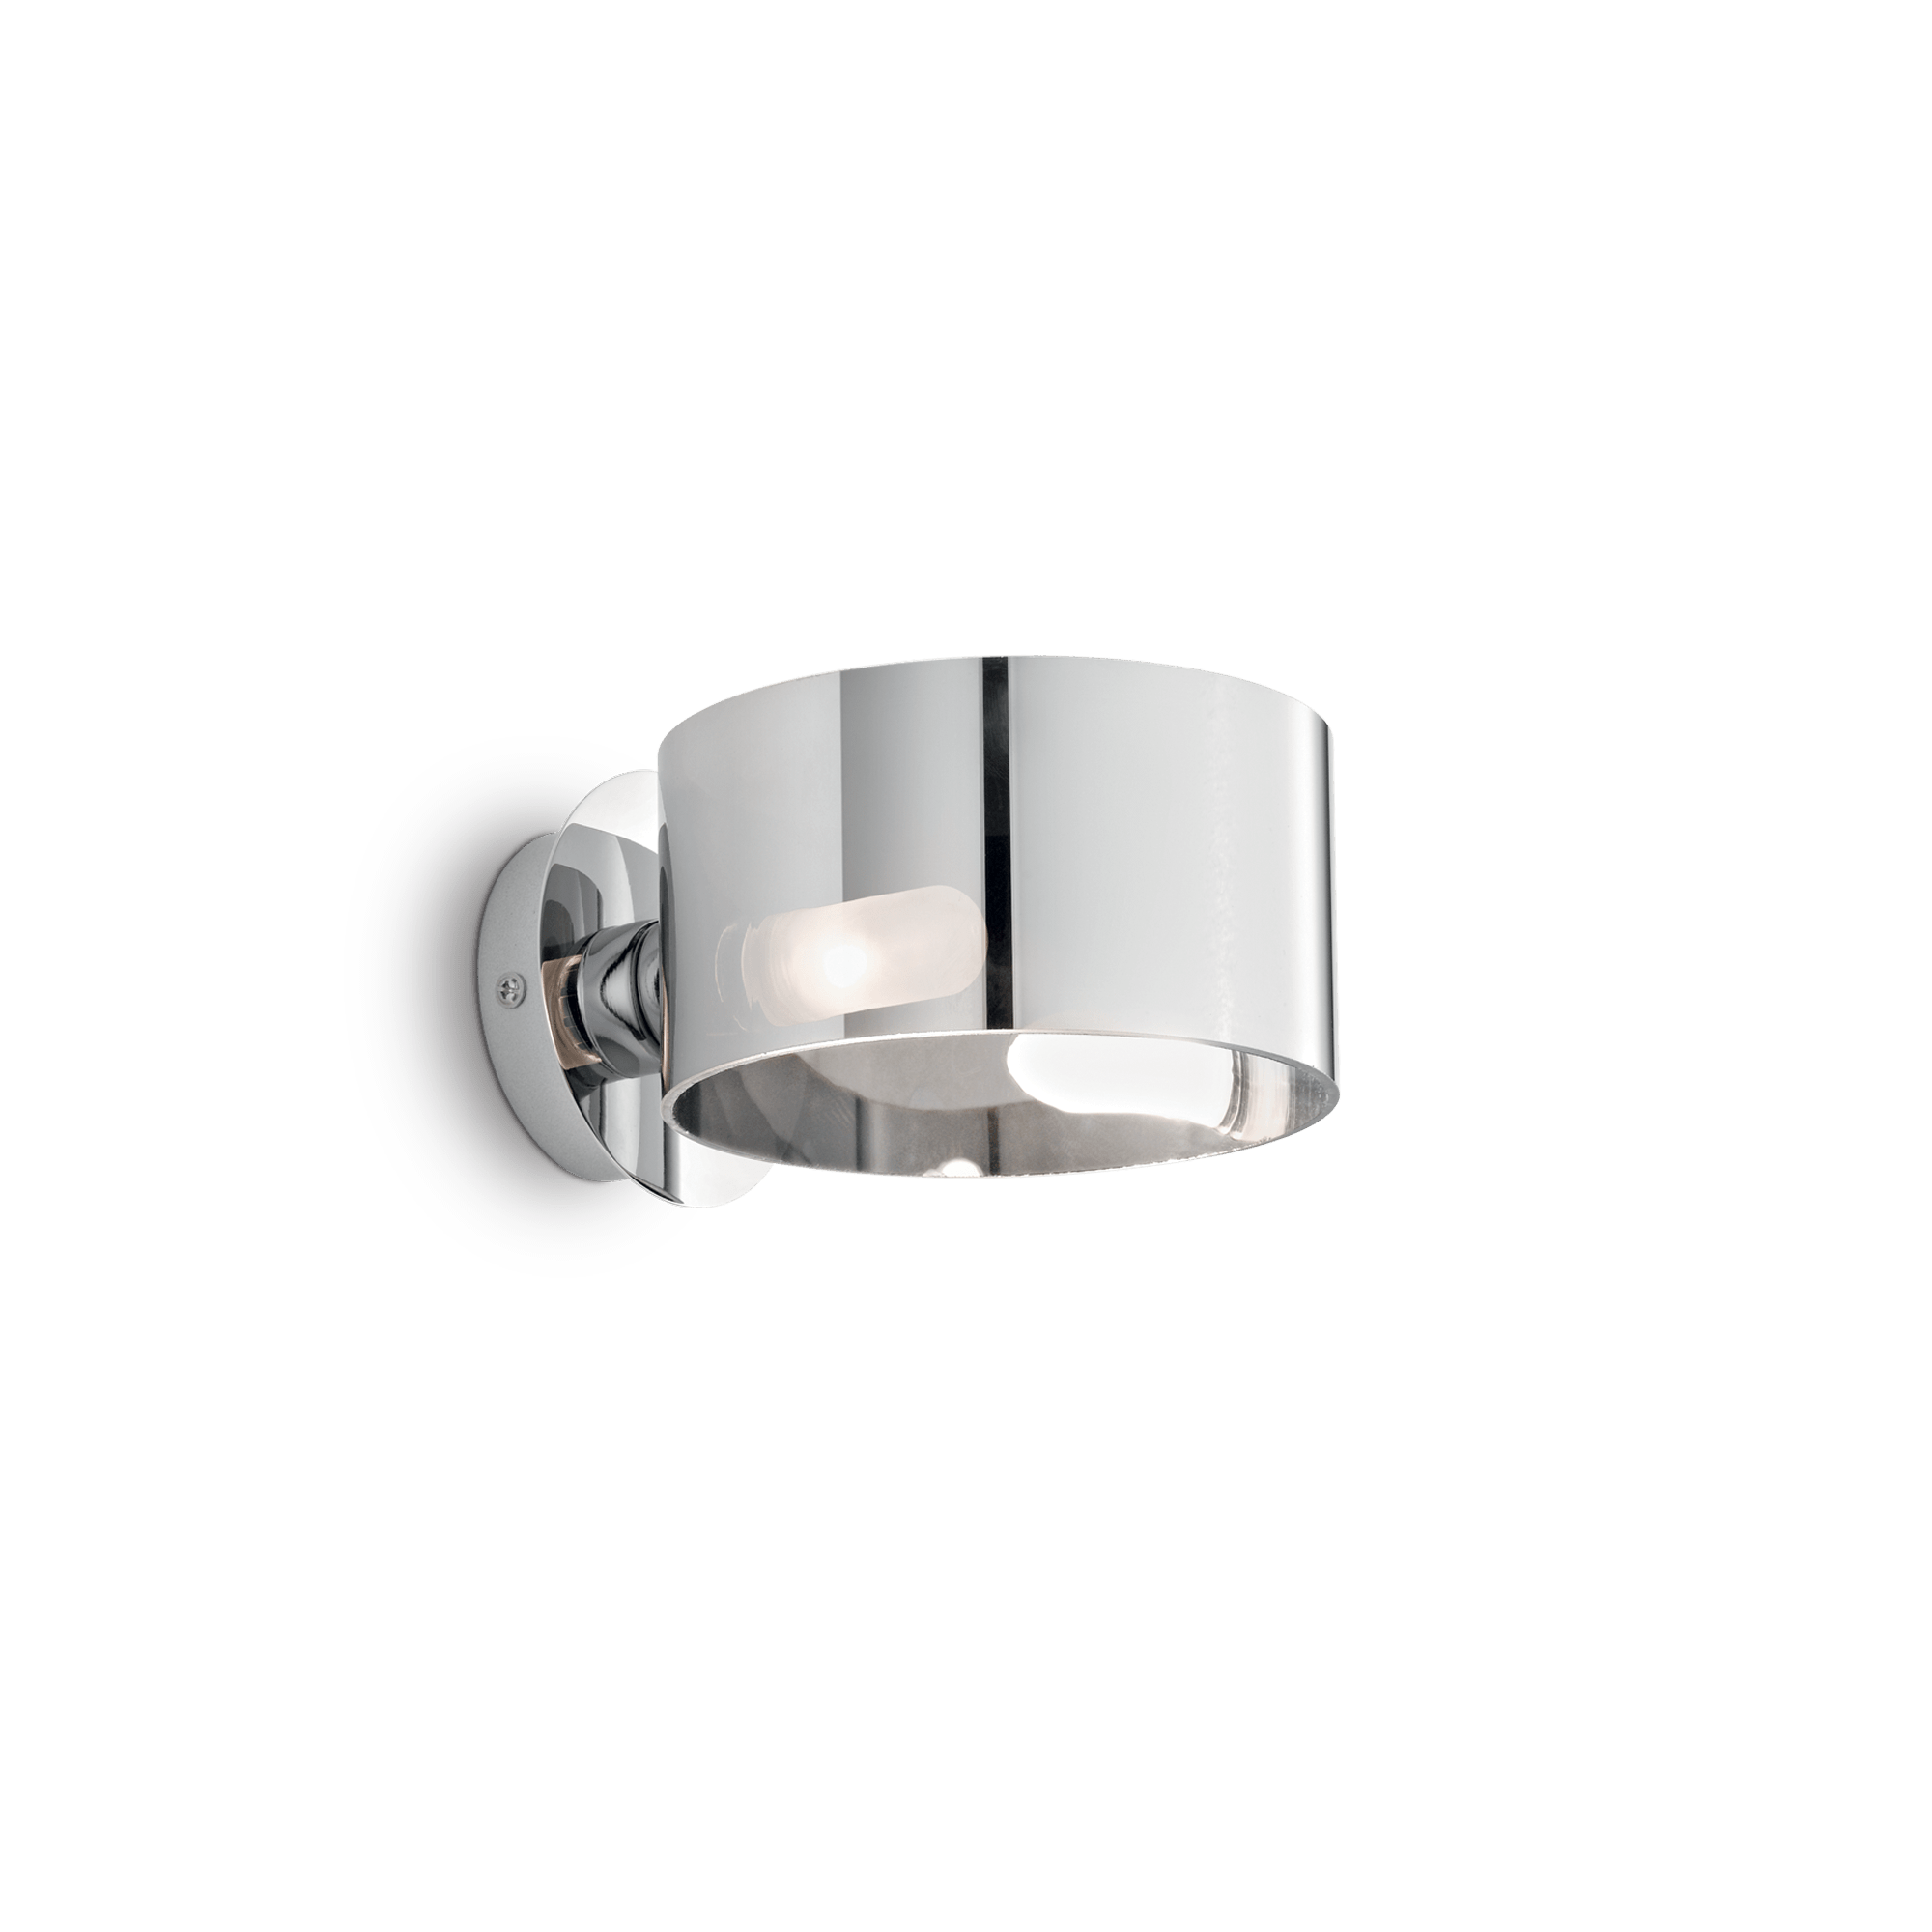 Ideal Lux 028323 Anello AP1 Cromo fali lámpa